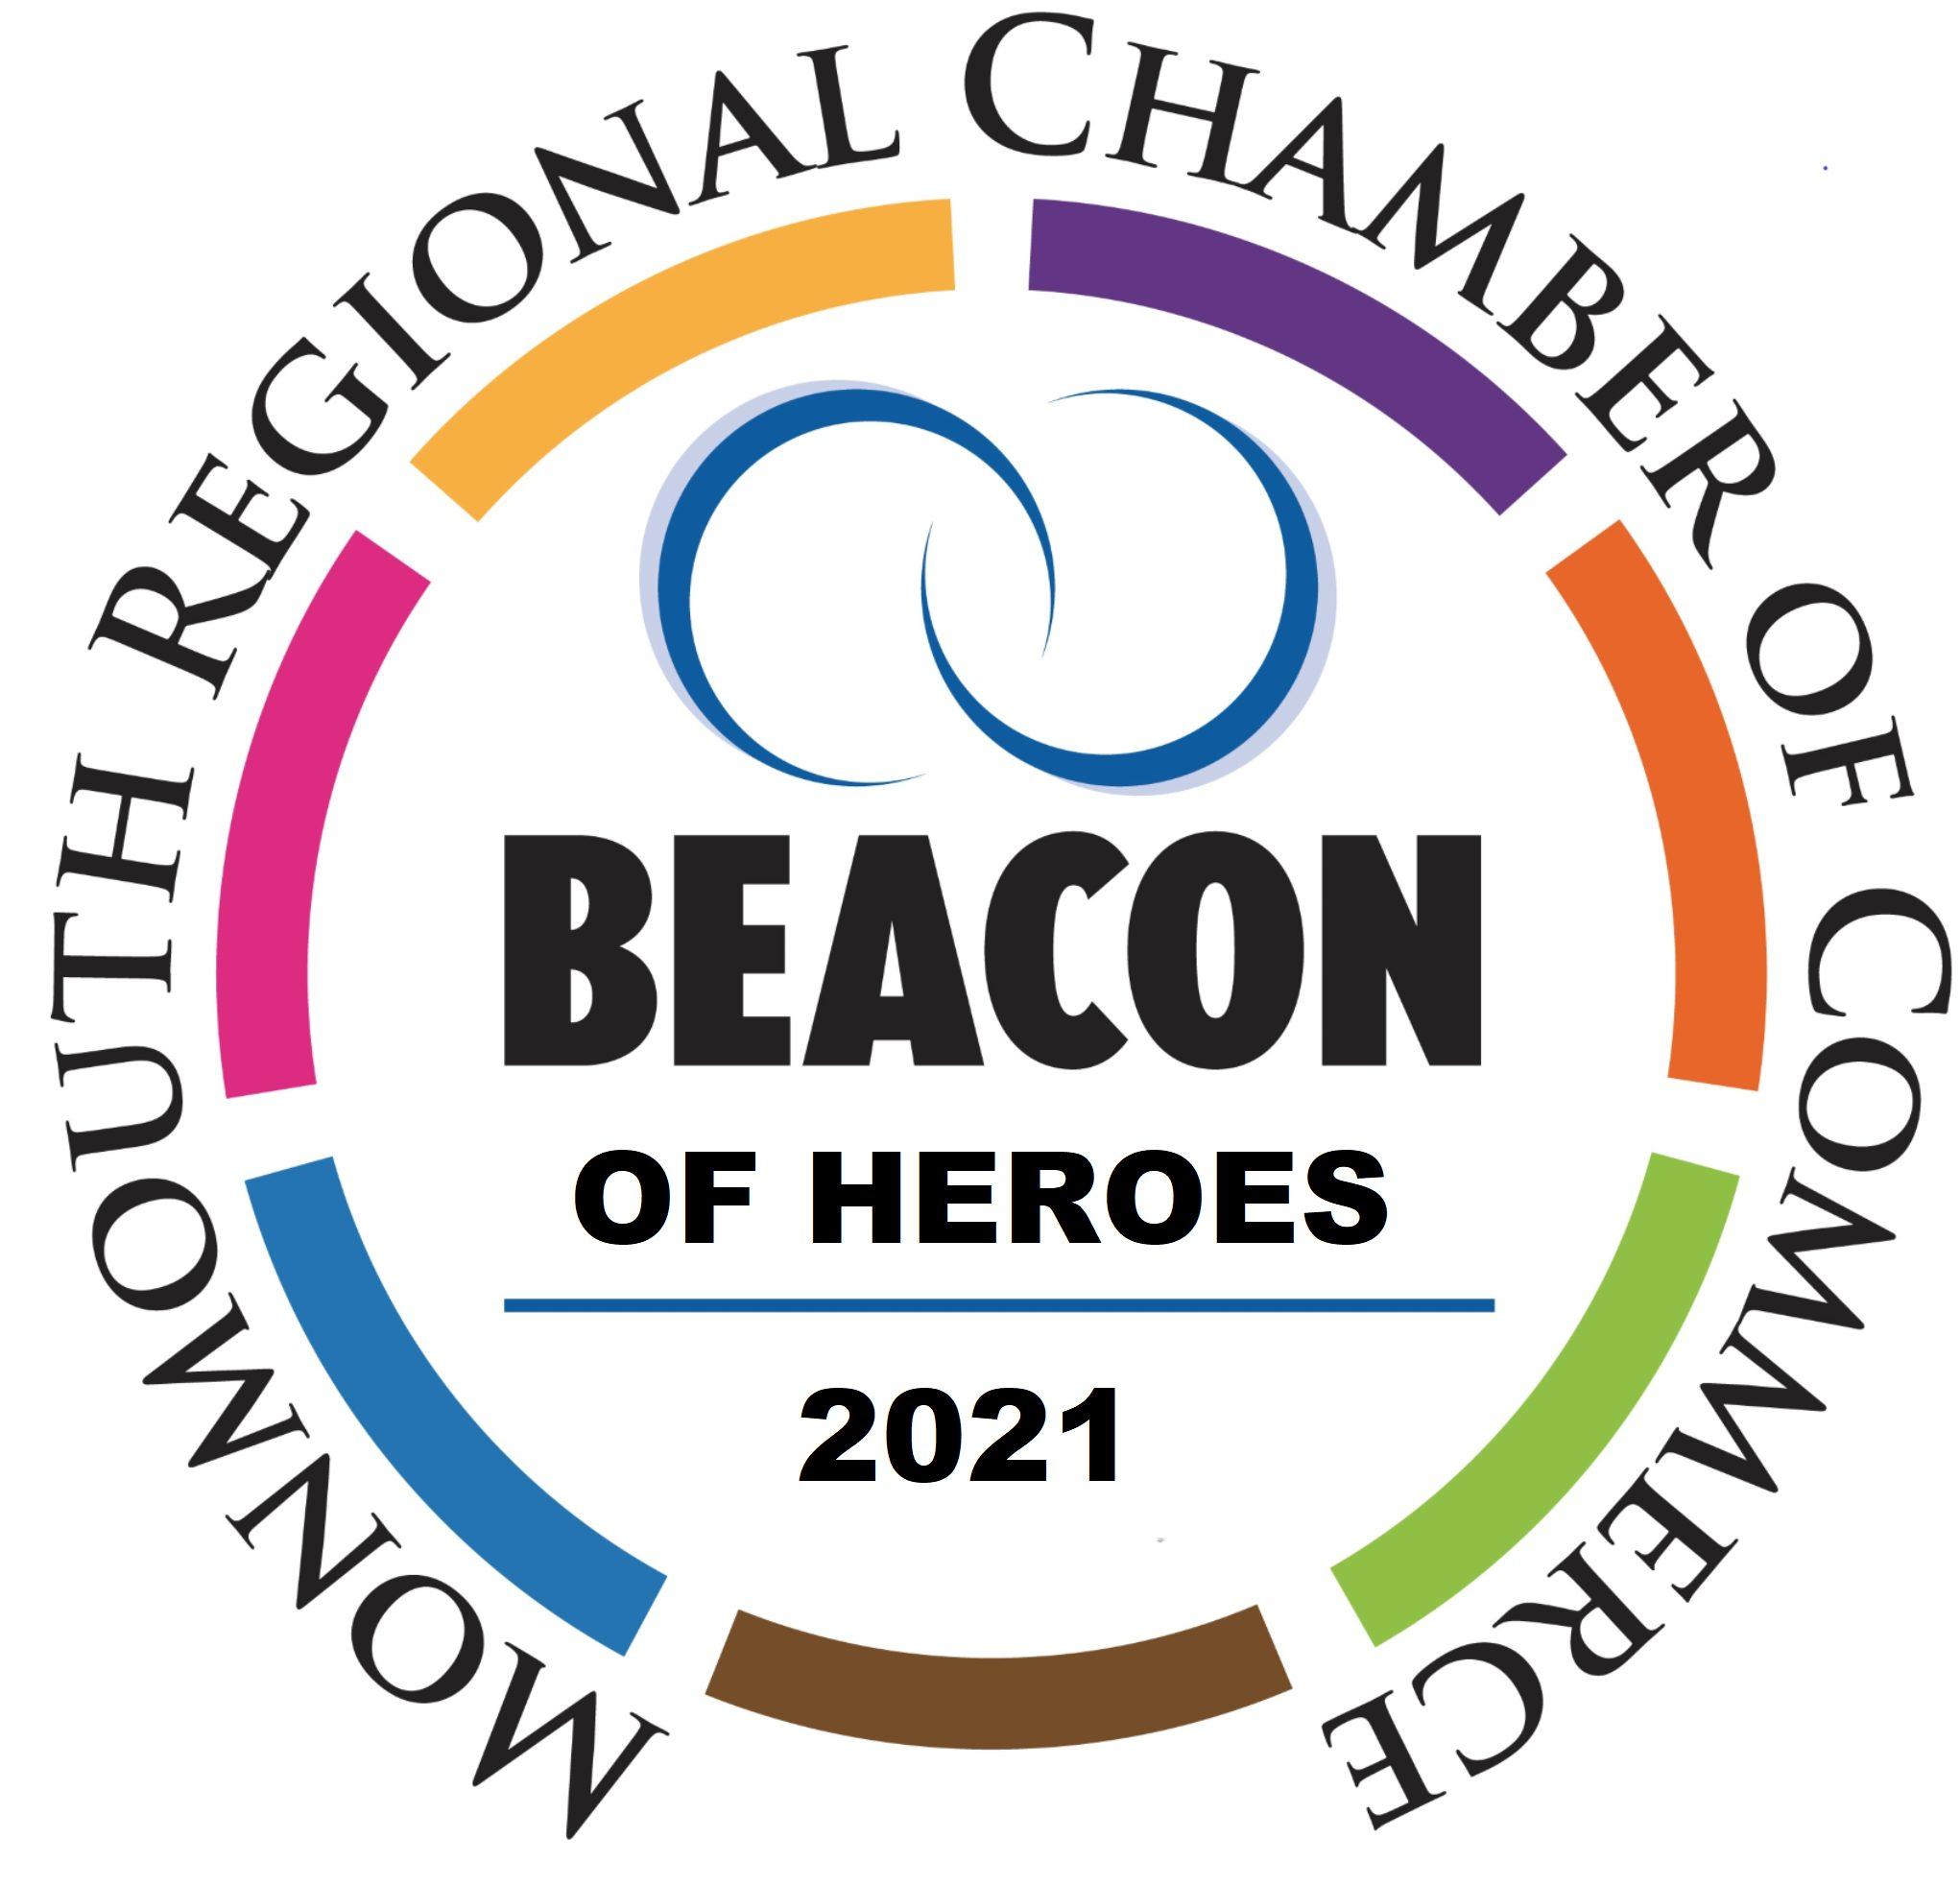 2021 Beacon of HEROES logo